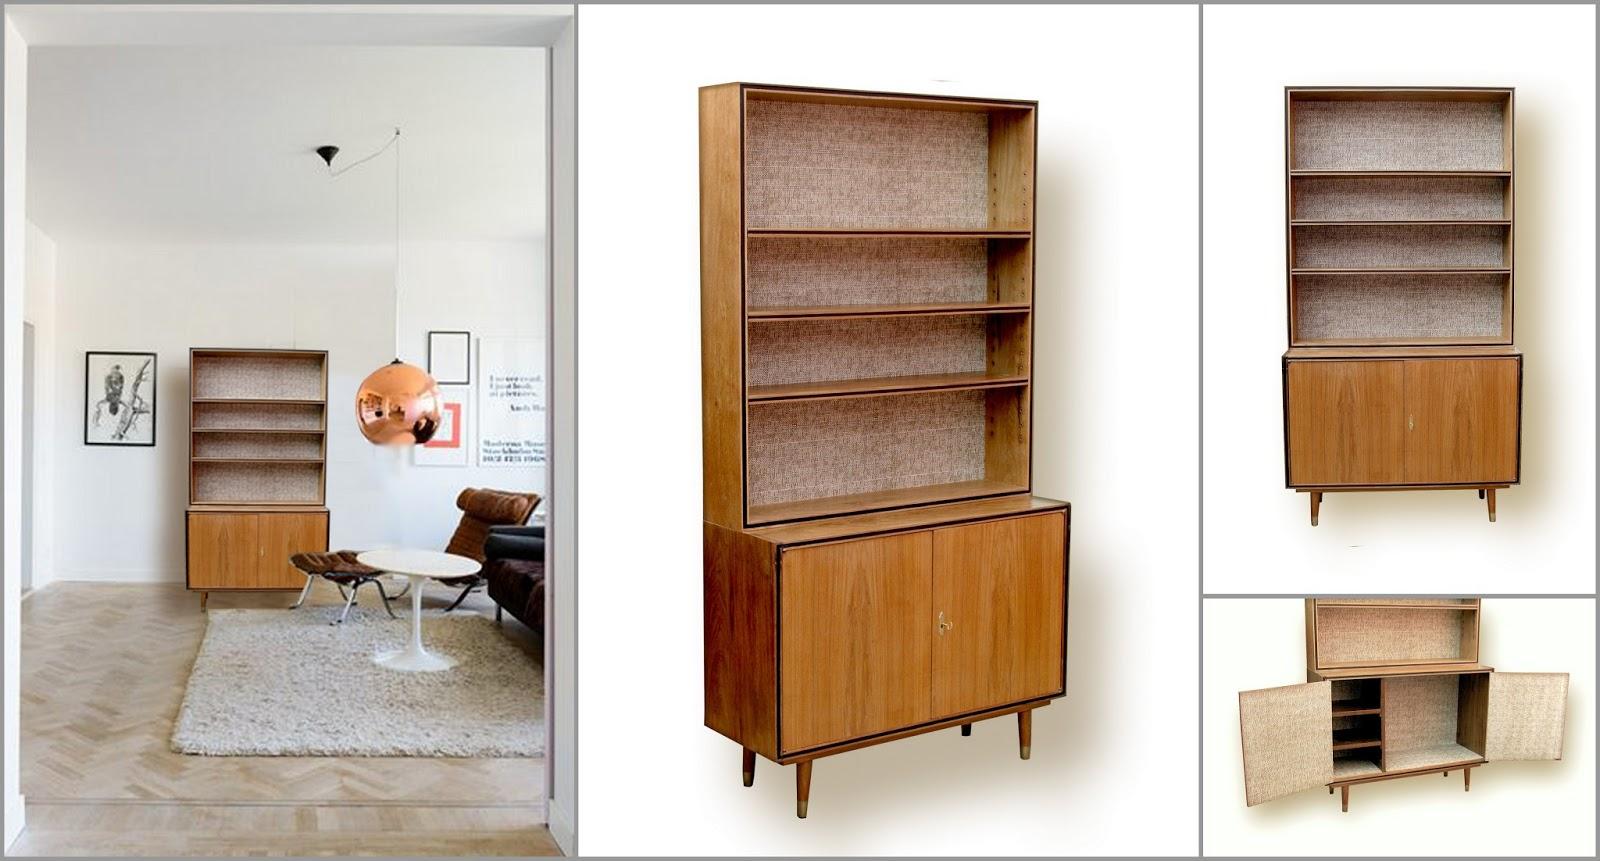 Muebles Vintage Portobellostreet - imagenes de muebles vintage